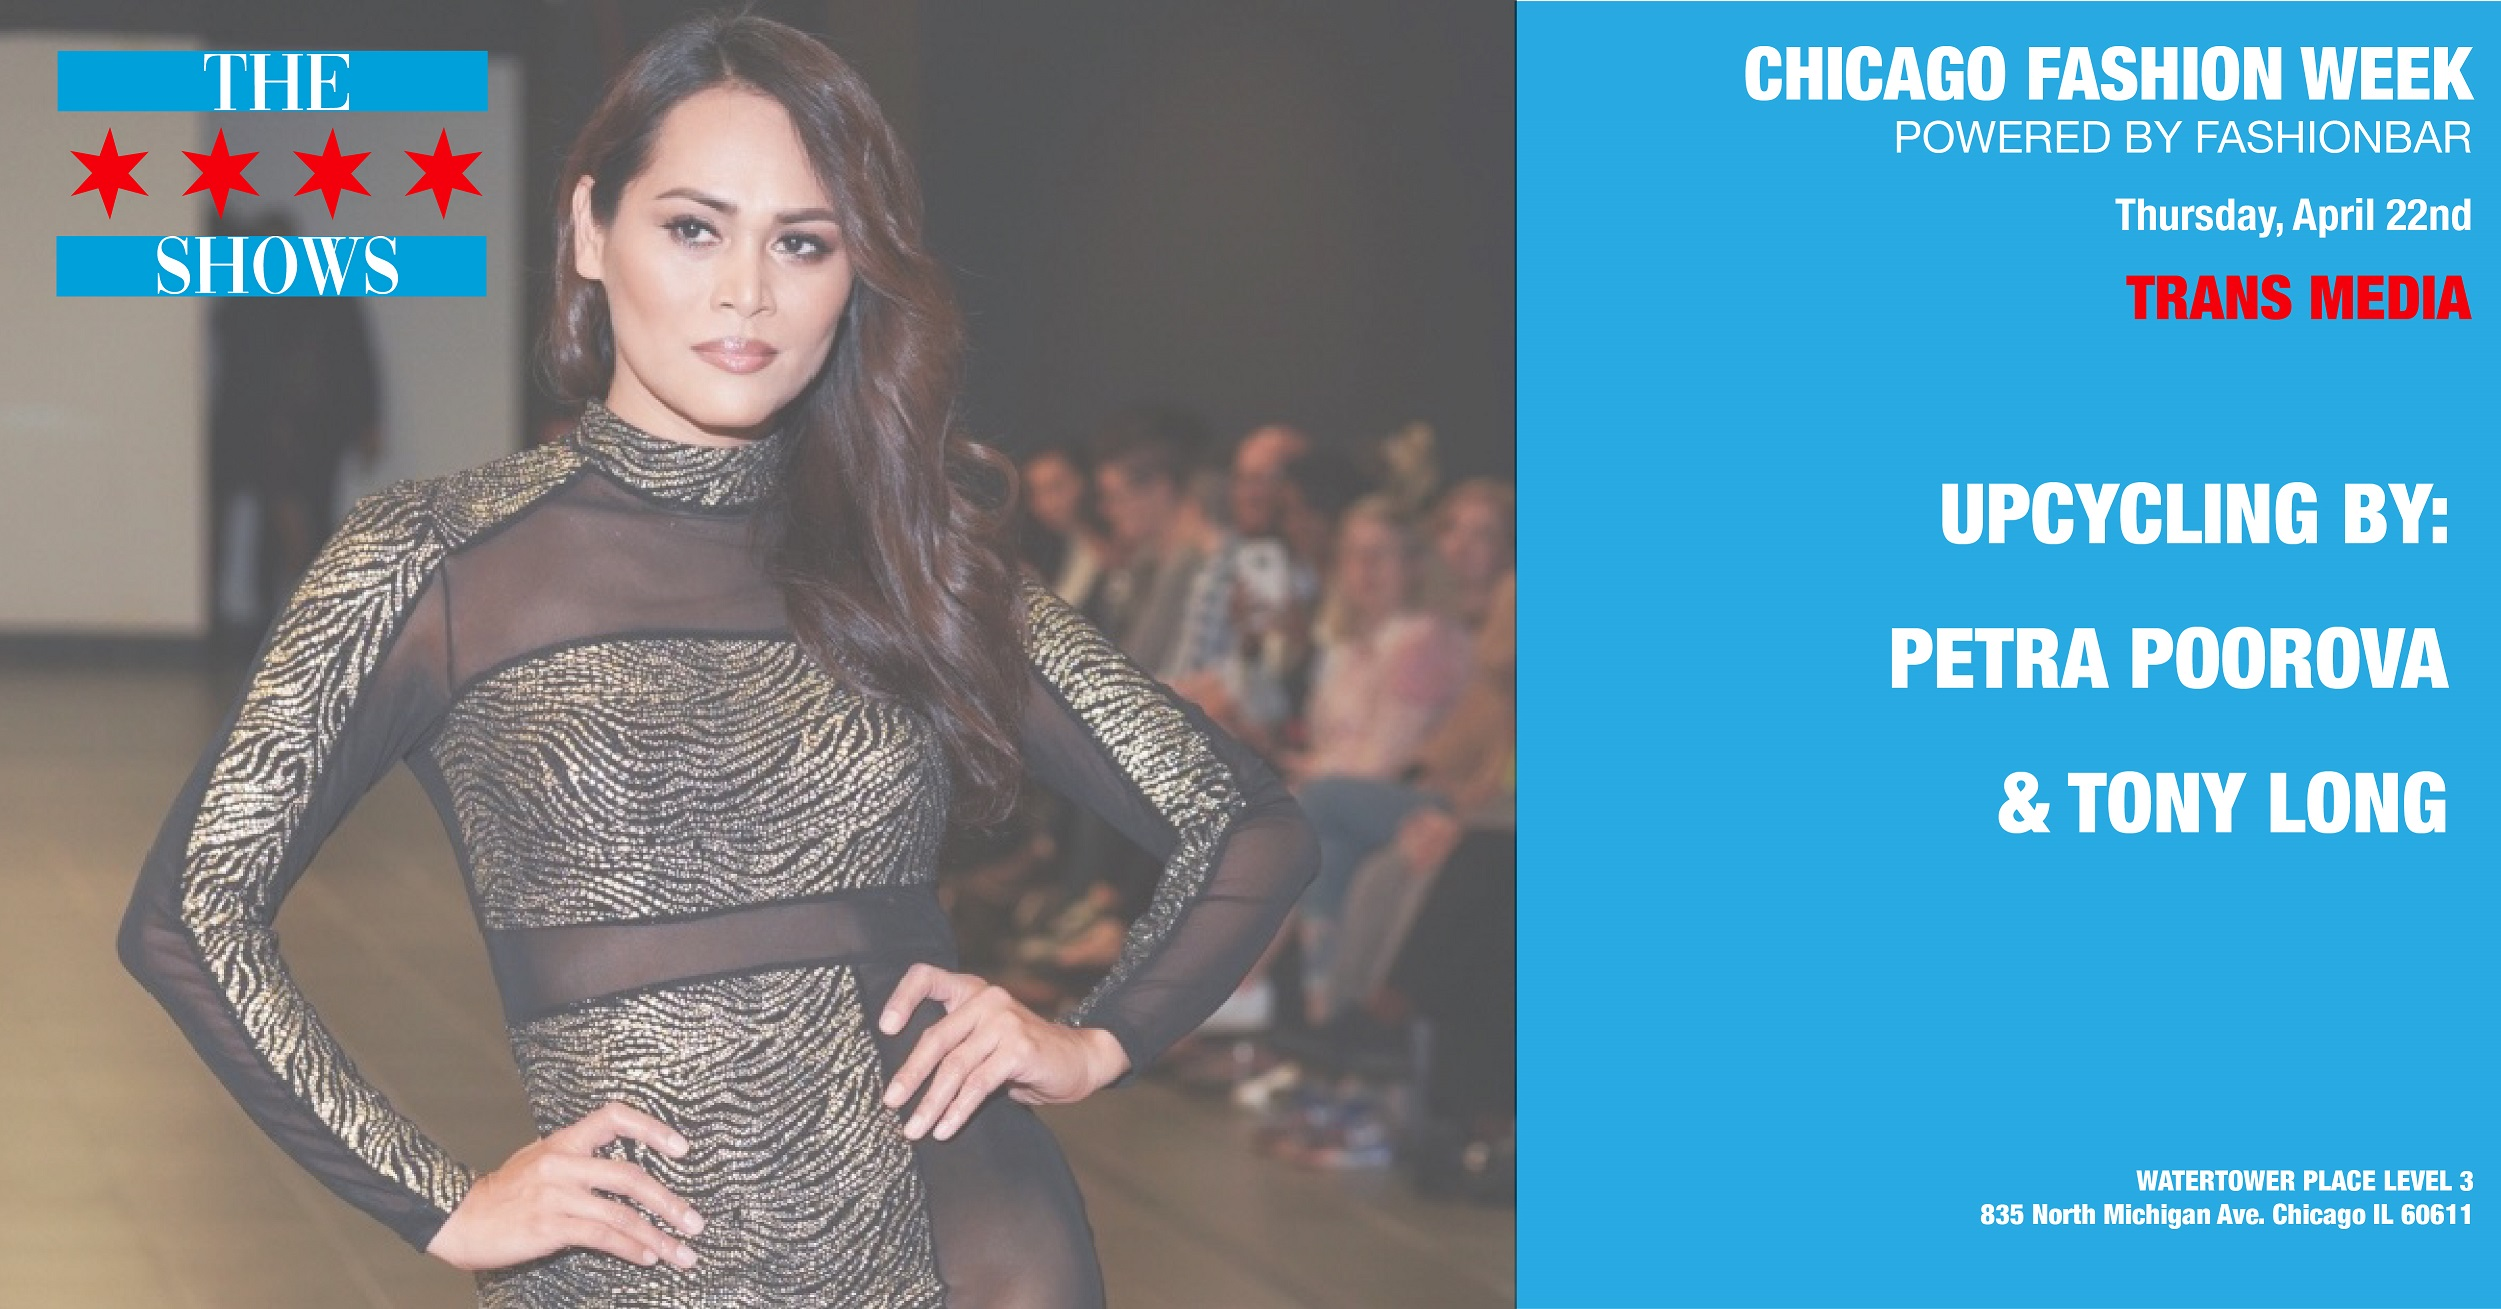 Trans, Media Fashion Show